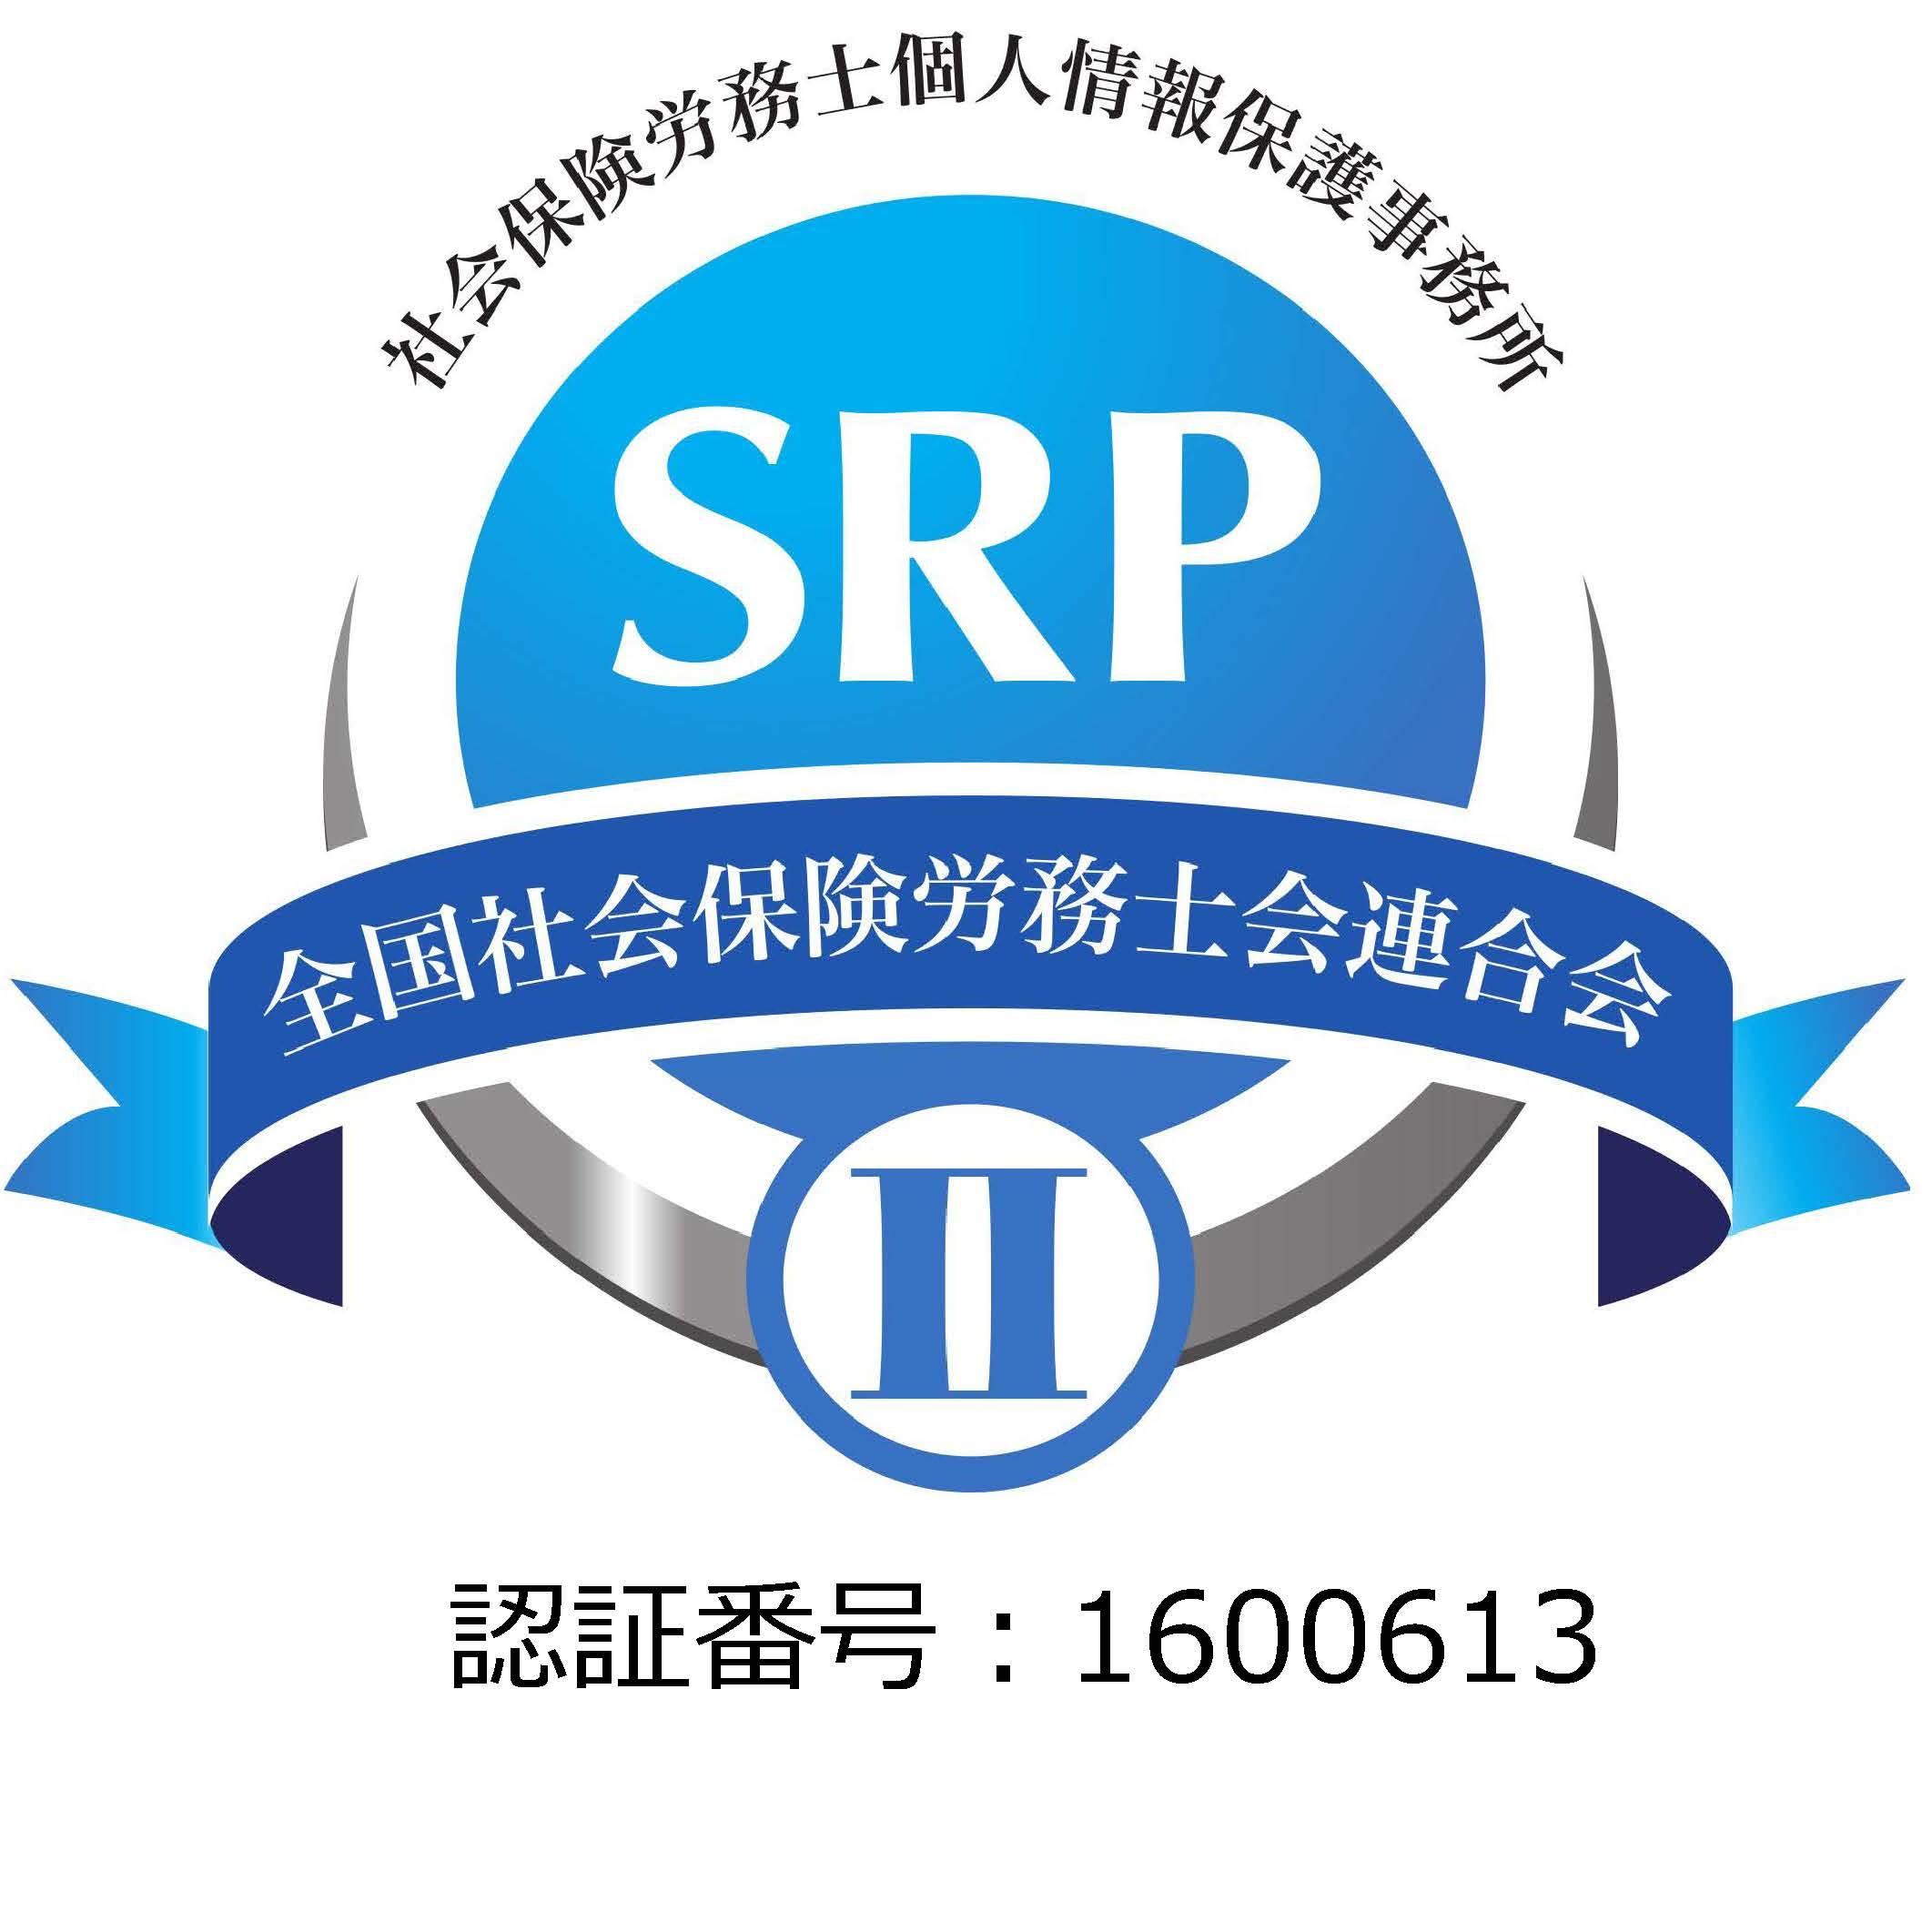 1600613 SRP2認証事務所